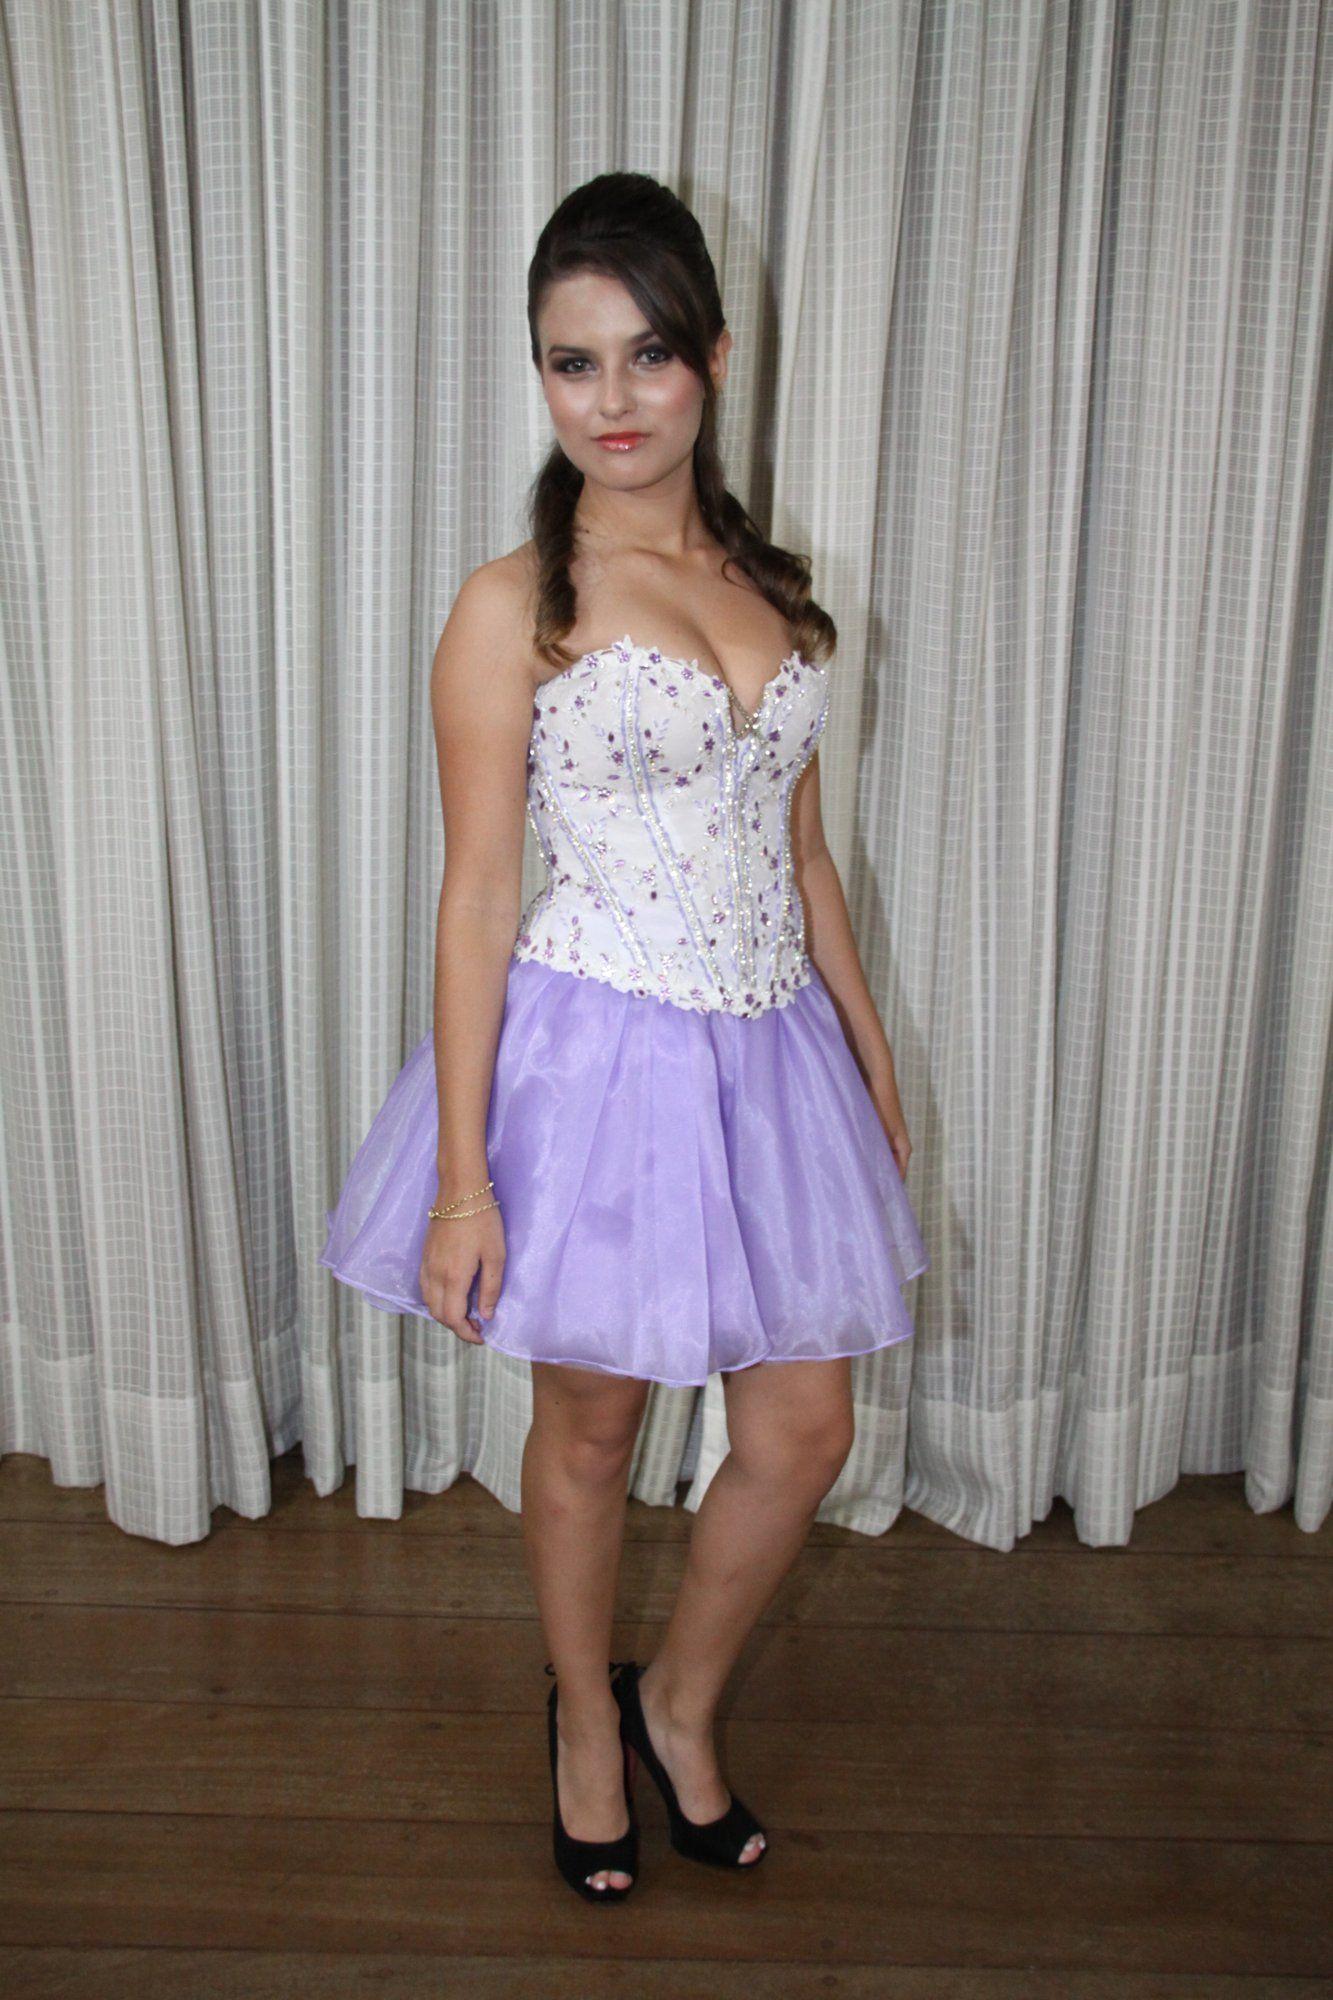 Vestido de Debutante Lilas - 2 - Hipnose Alta Costura e Spa para Noivas e Noivos - Campinas - SP Vestido de Debutante, Vestido de Debutante Lilas, Hipnose Alta Costura